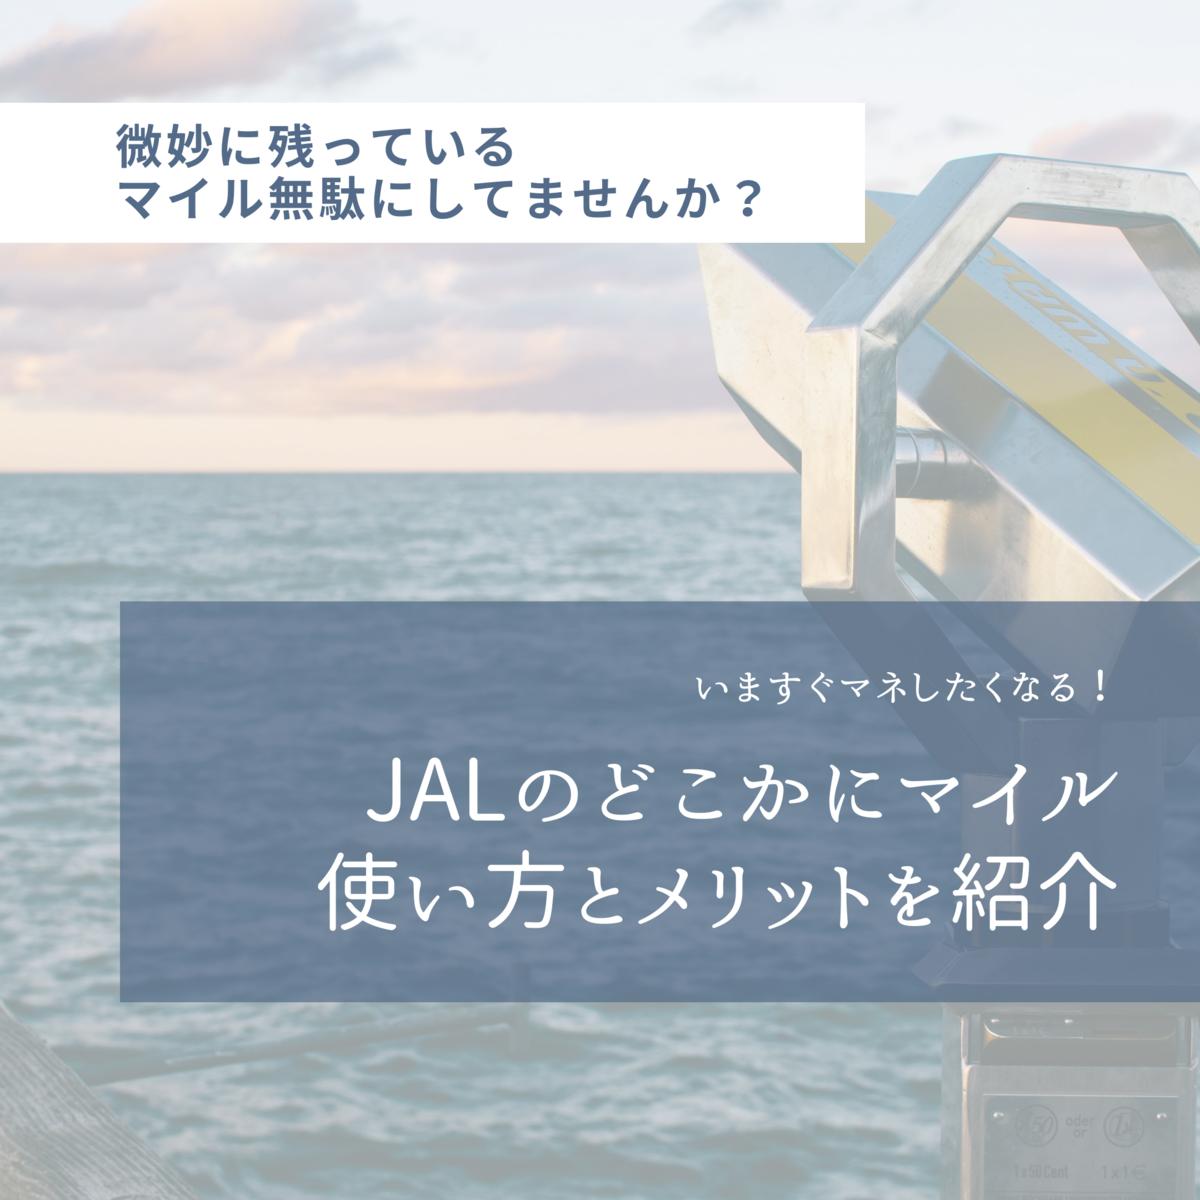 JALのどこかにマイルの使い方とは!?メリットデメリットも紹介